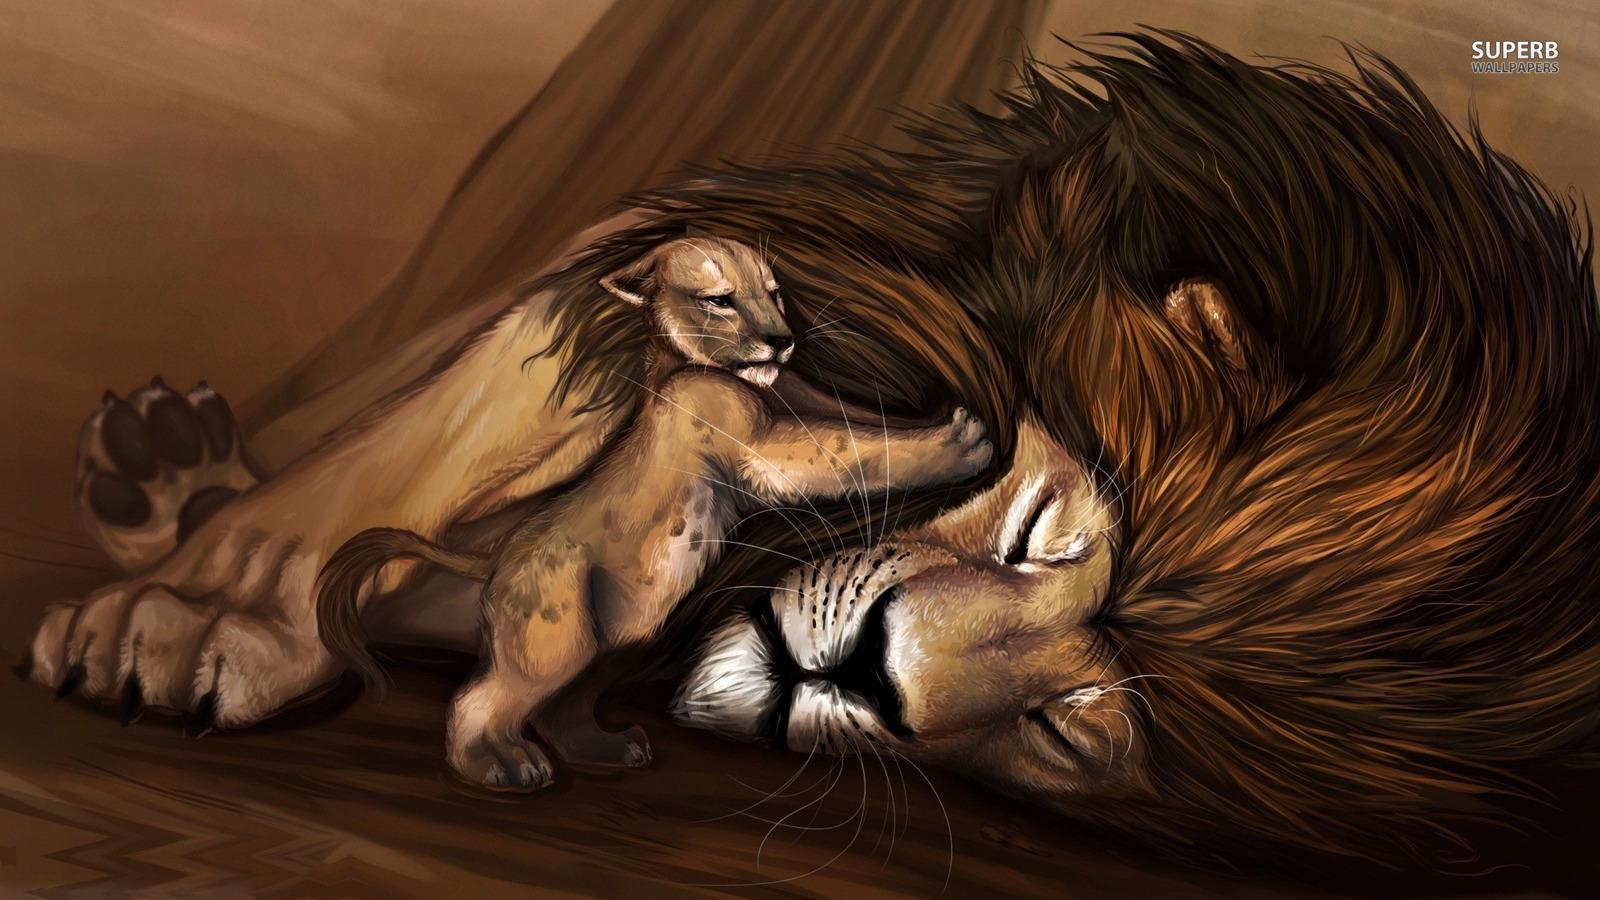 Simba and Mufasa